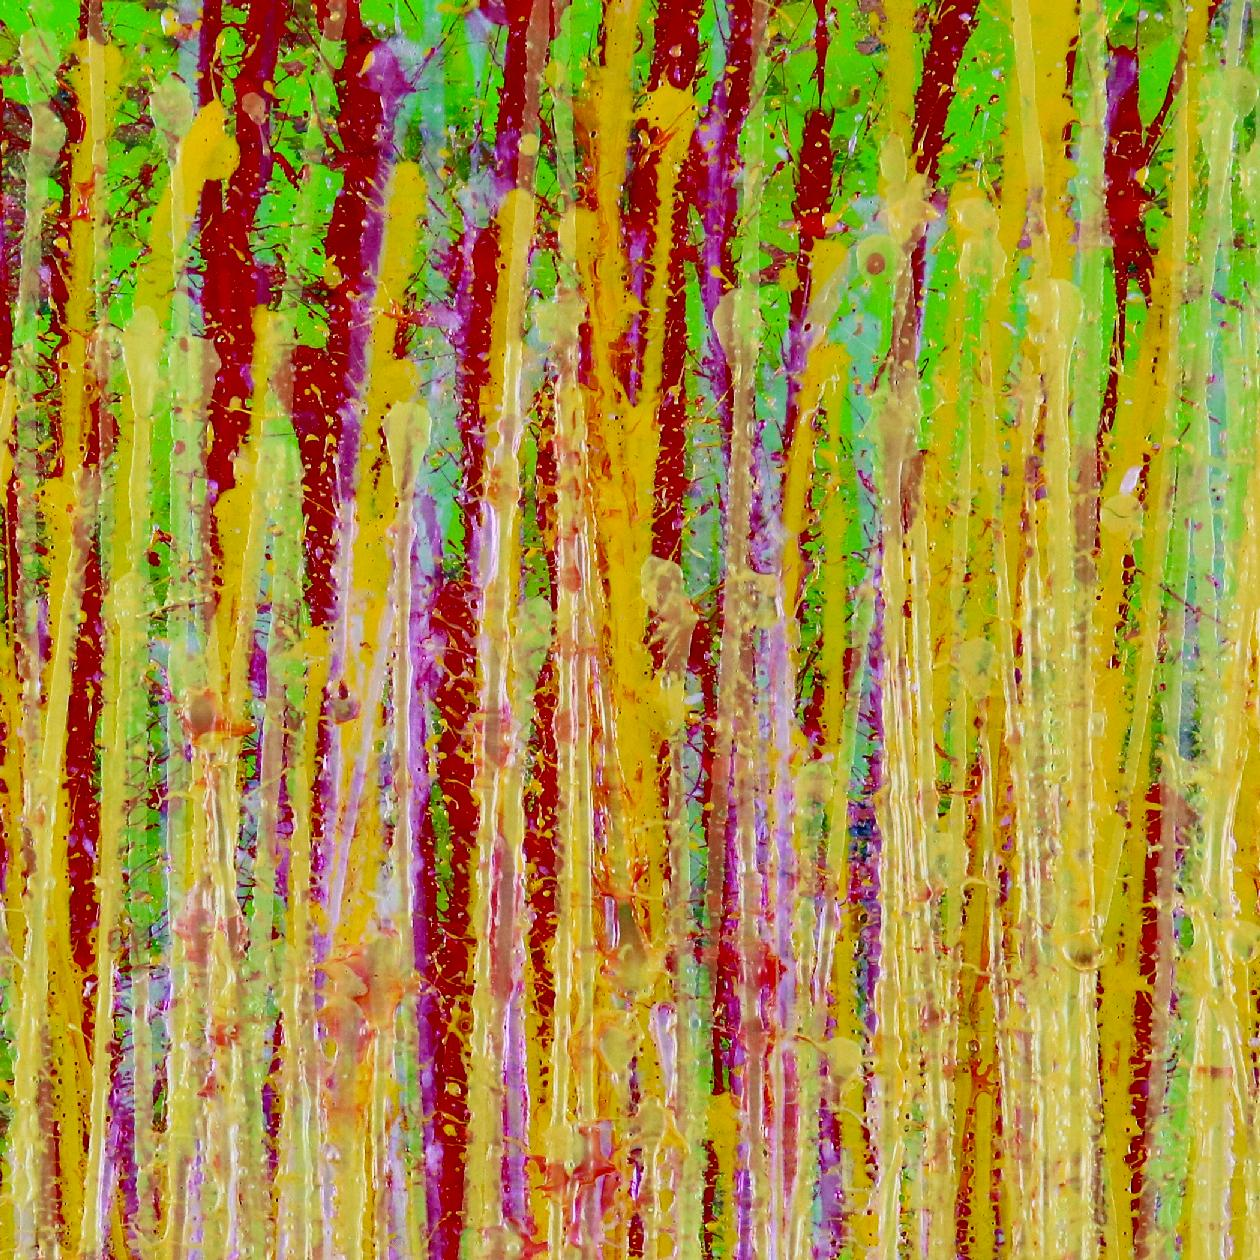 Detail - Awakening Garden 7 (2020) by Nestor Toro